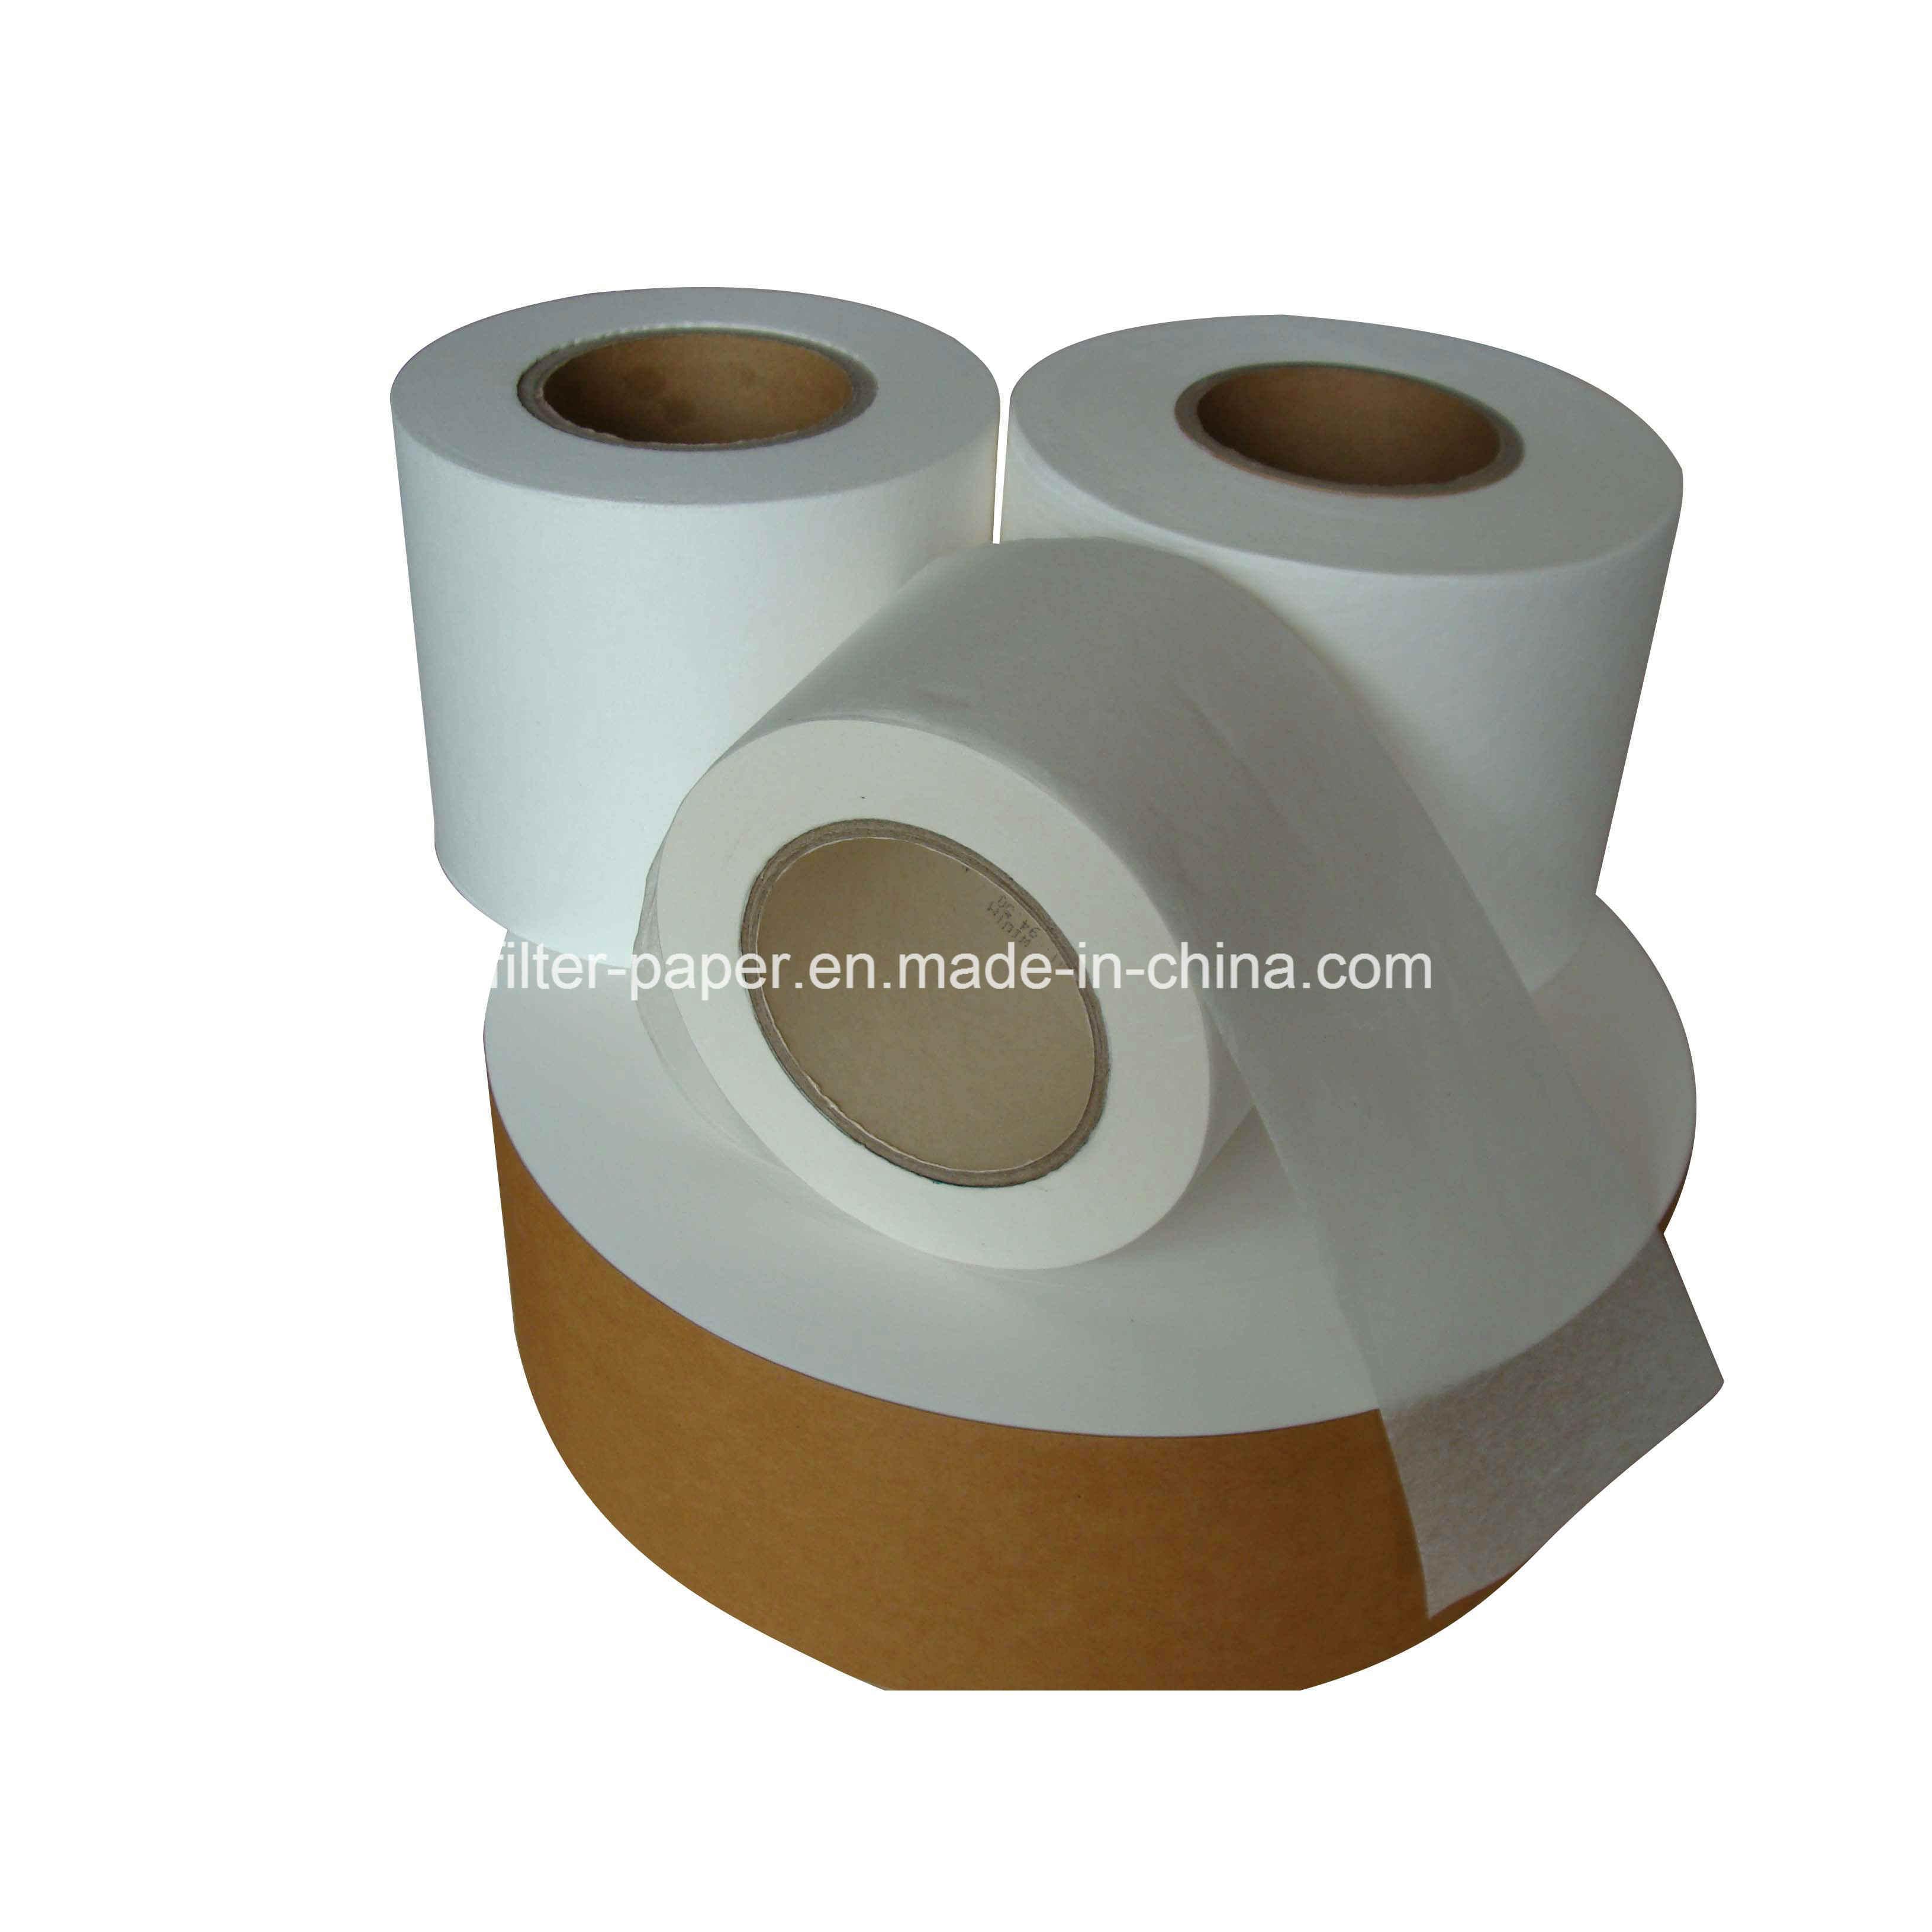 18GSM Abaca Pulp Heat Seal Tea Bag Filter Paper